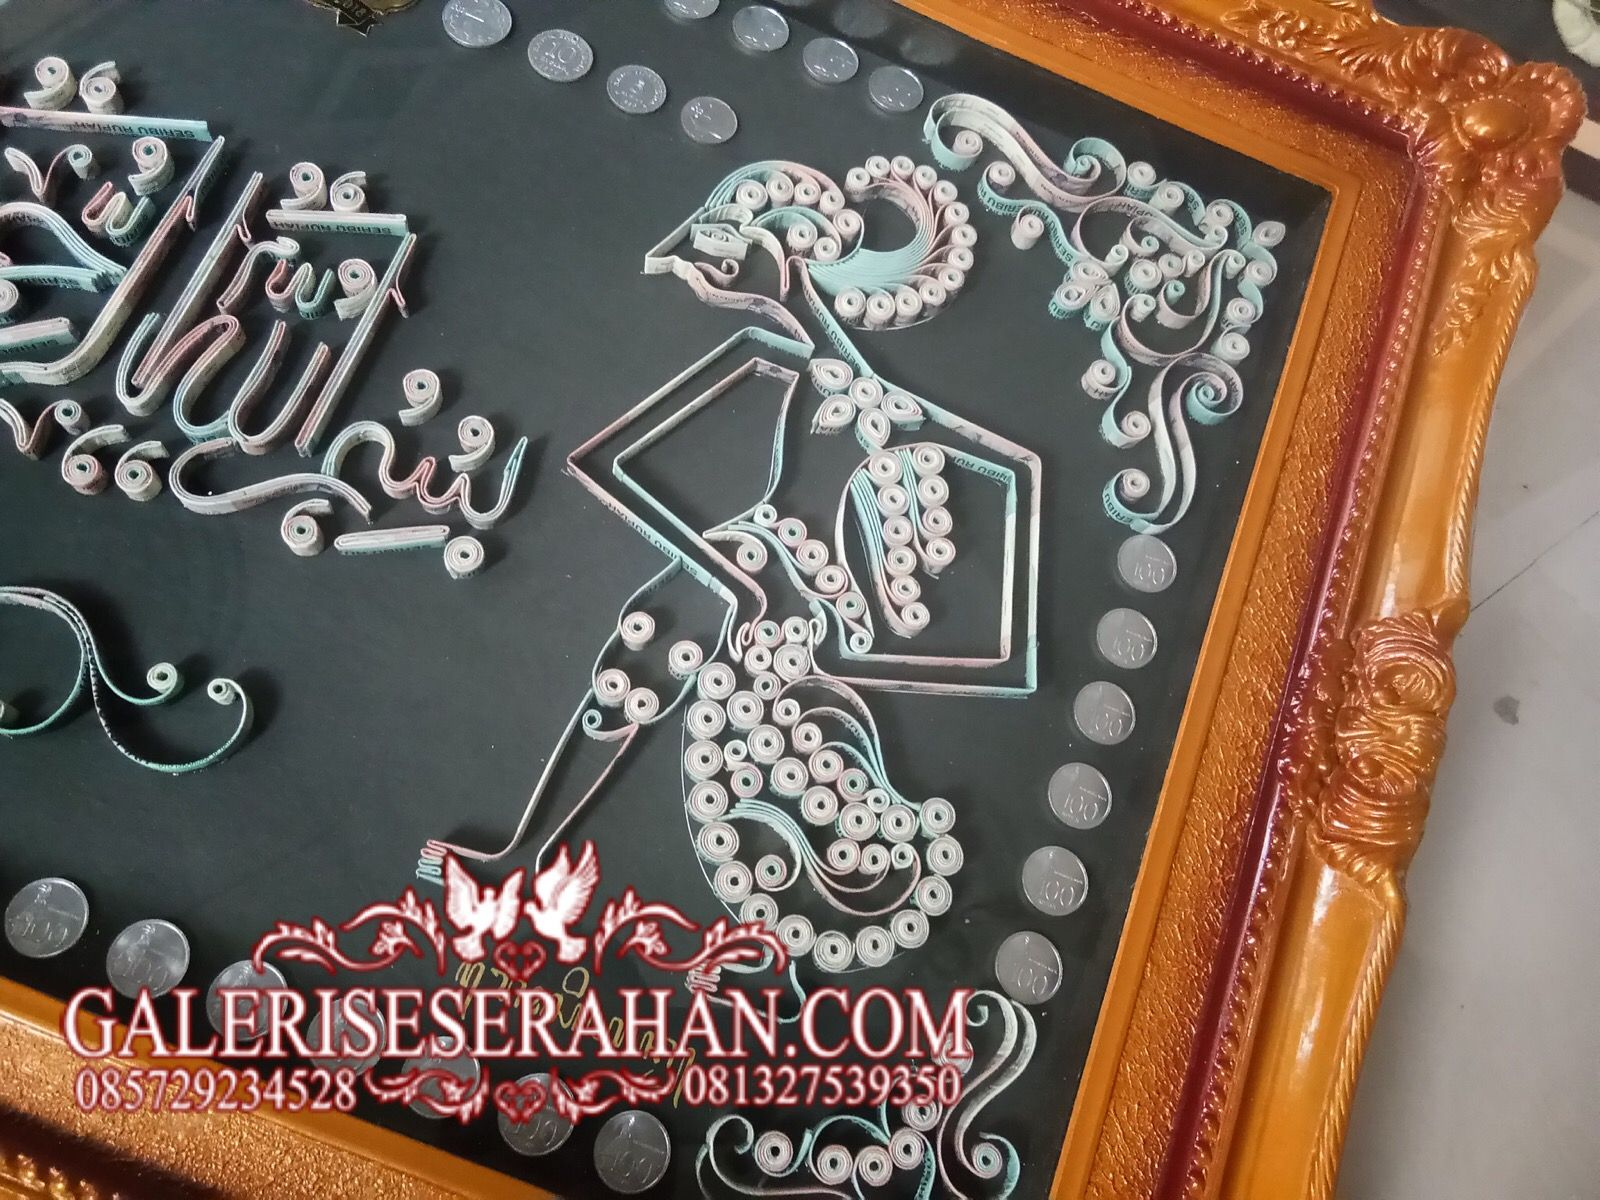 Mahar uang kaligrafi bismillah & wayang kamajaya kamaratih